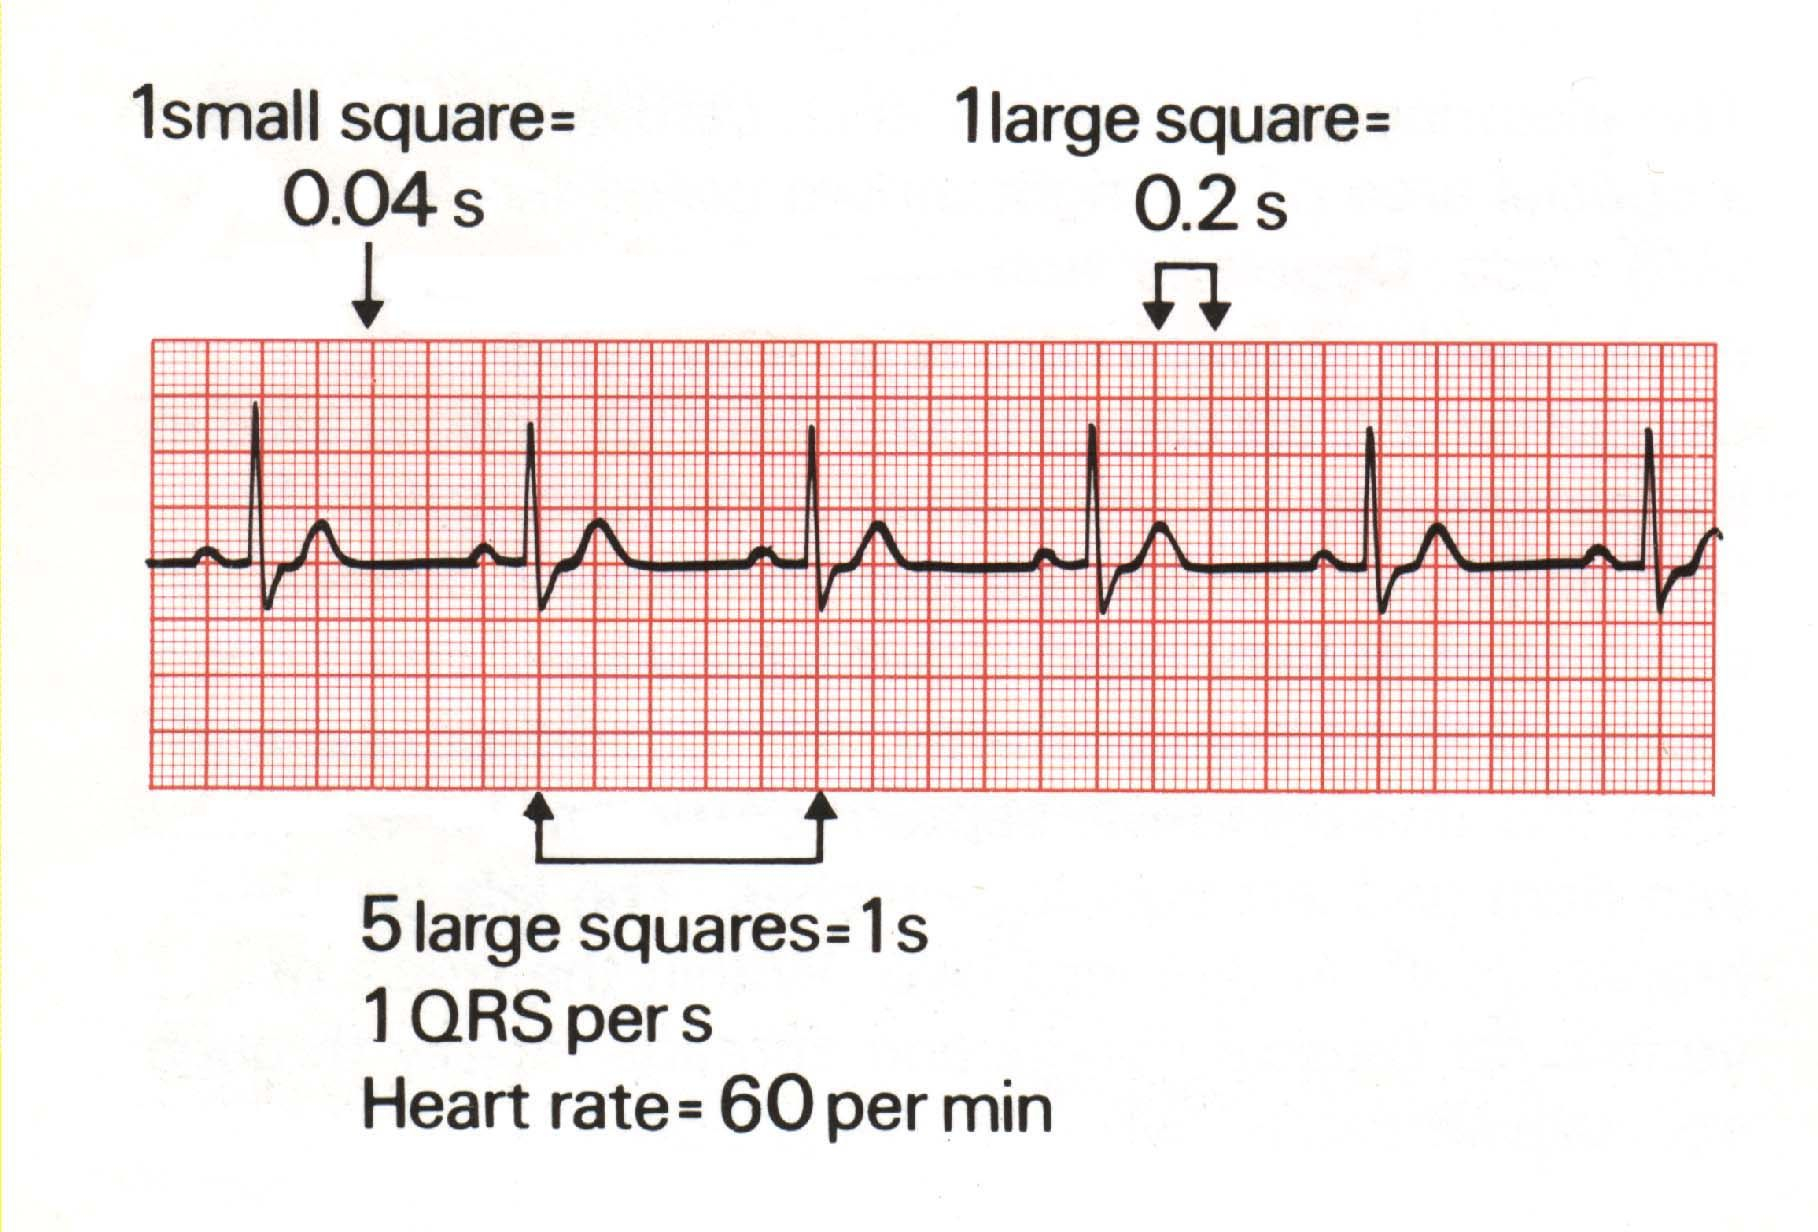 Standard Ecg Tracing Of Sinus Rhythm   Digital Image, Image